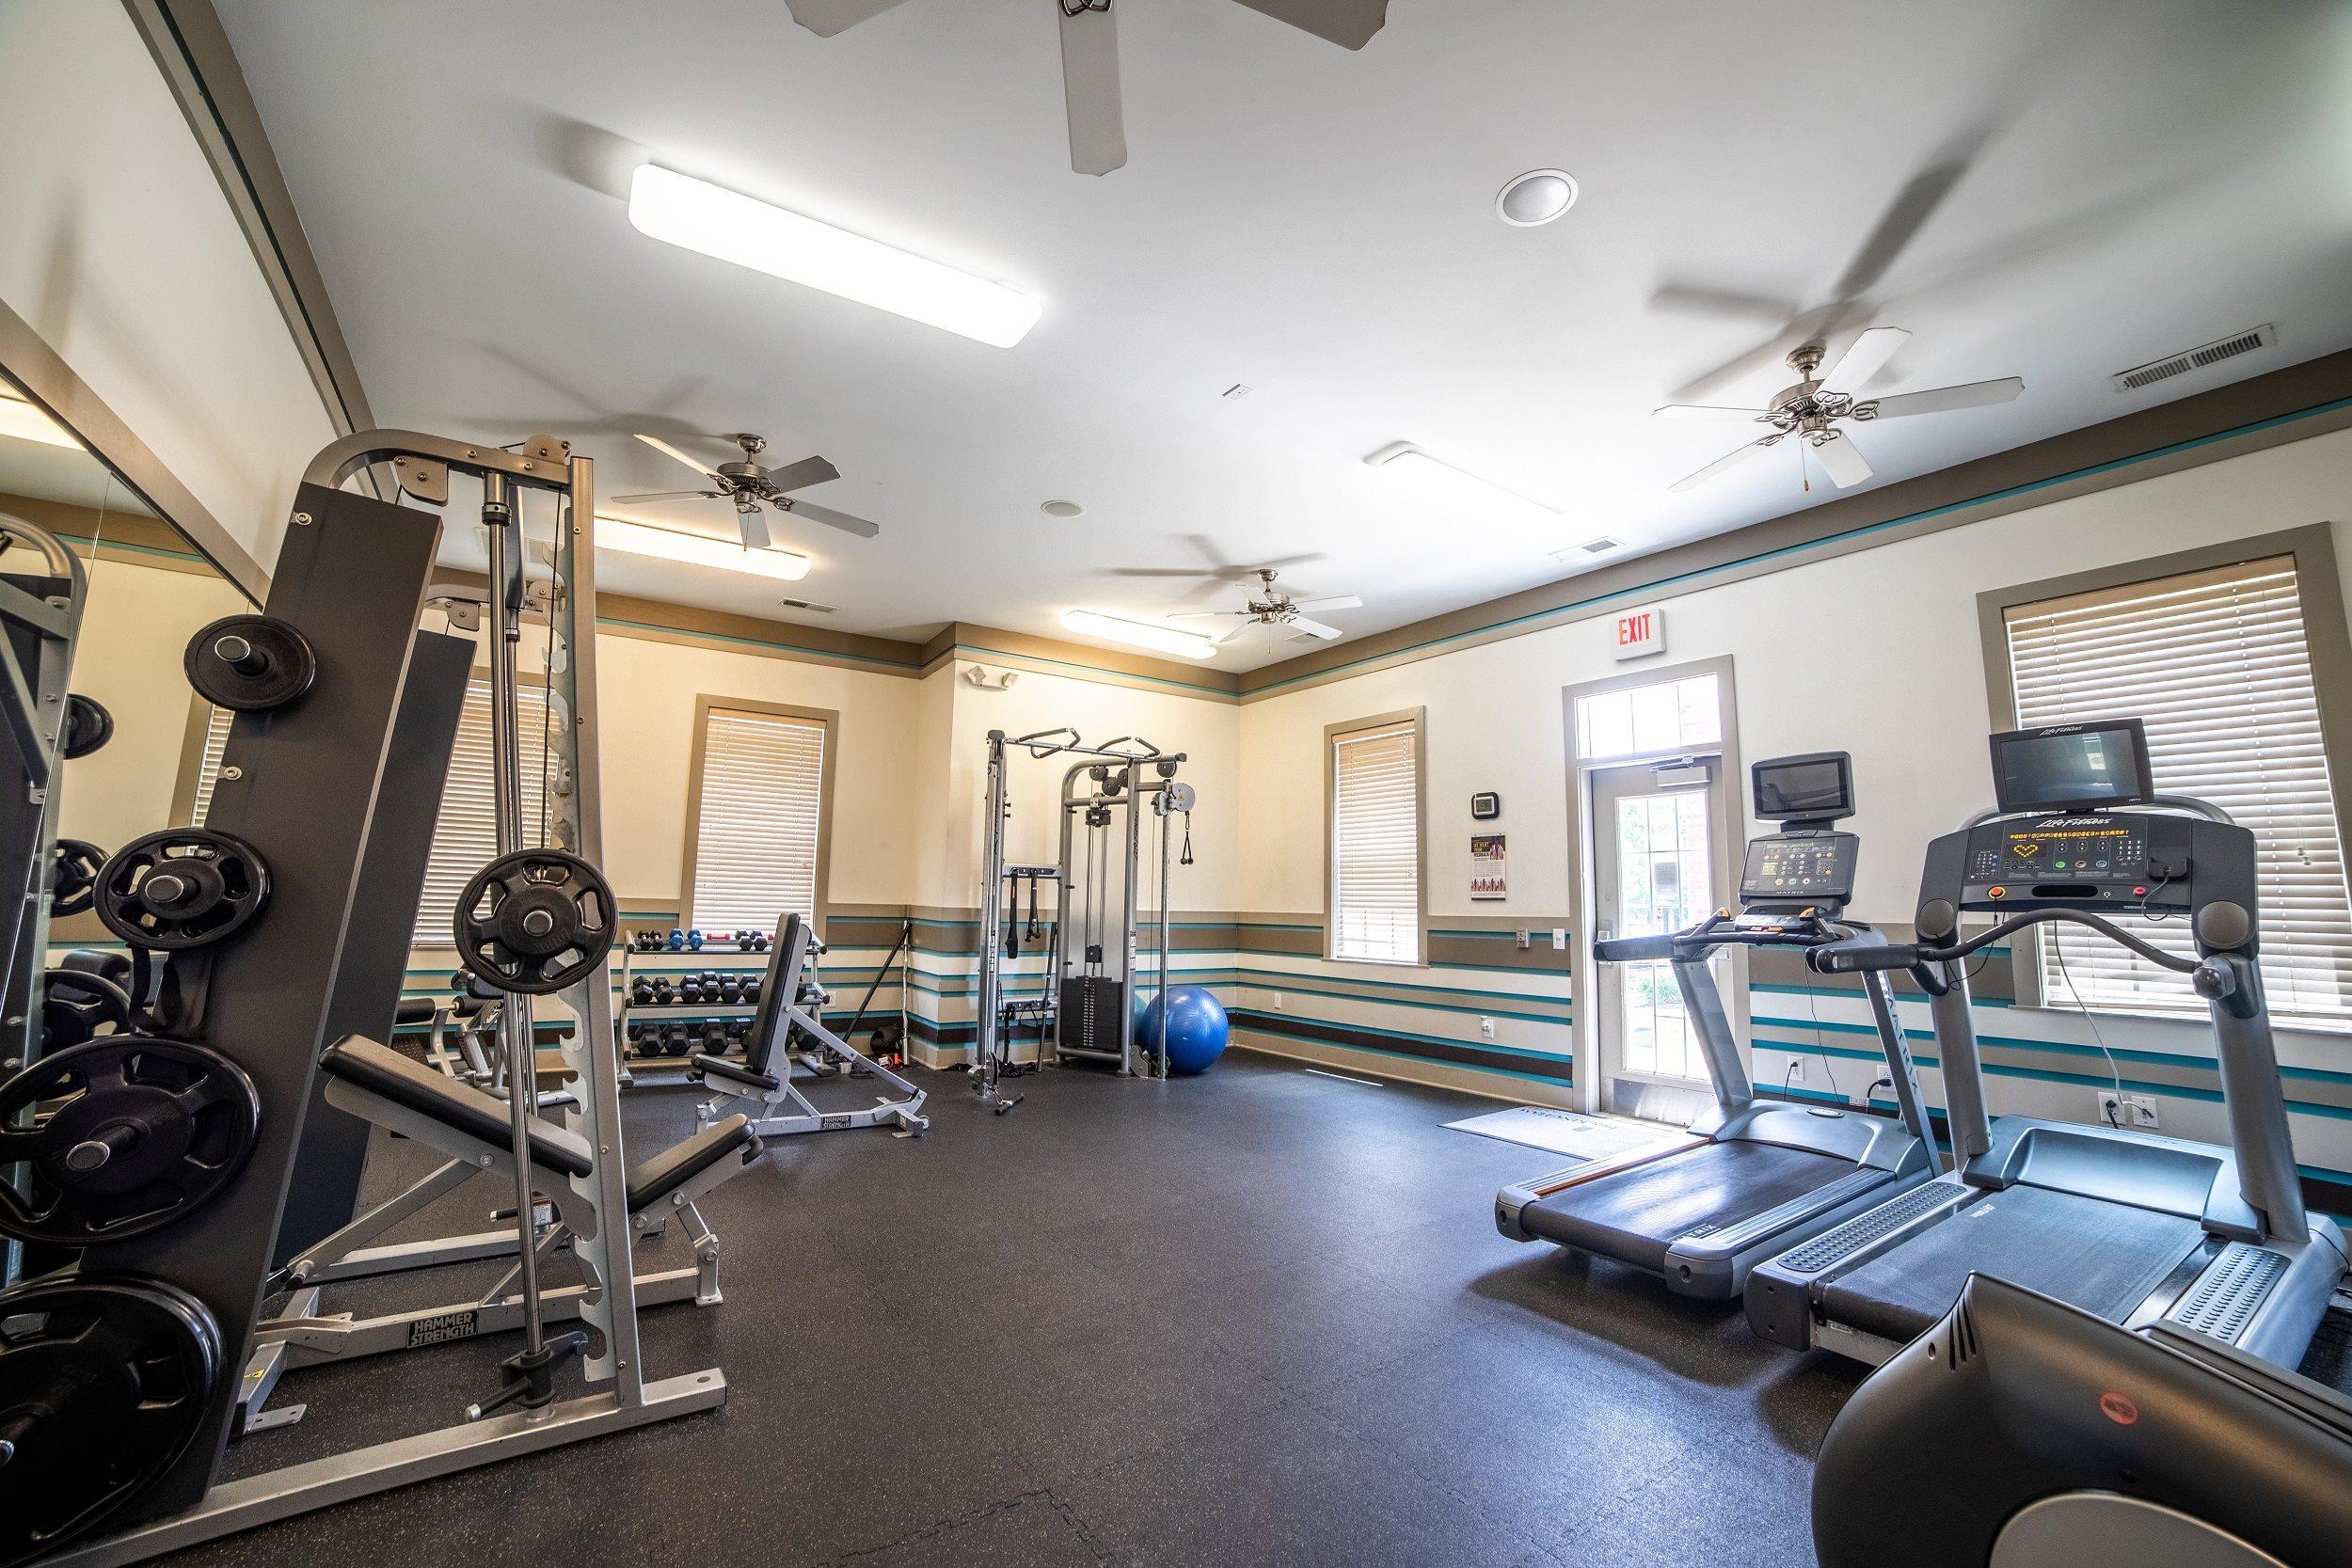 Fitness Center With Modern Equipment at Buckingham Monon Living, Indiana